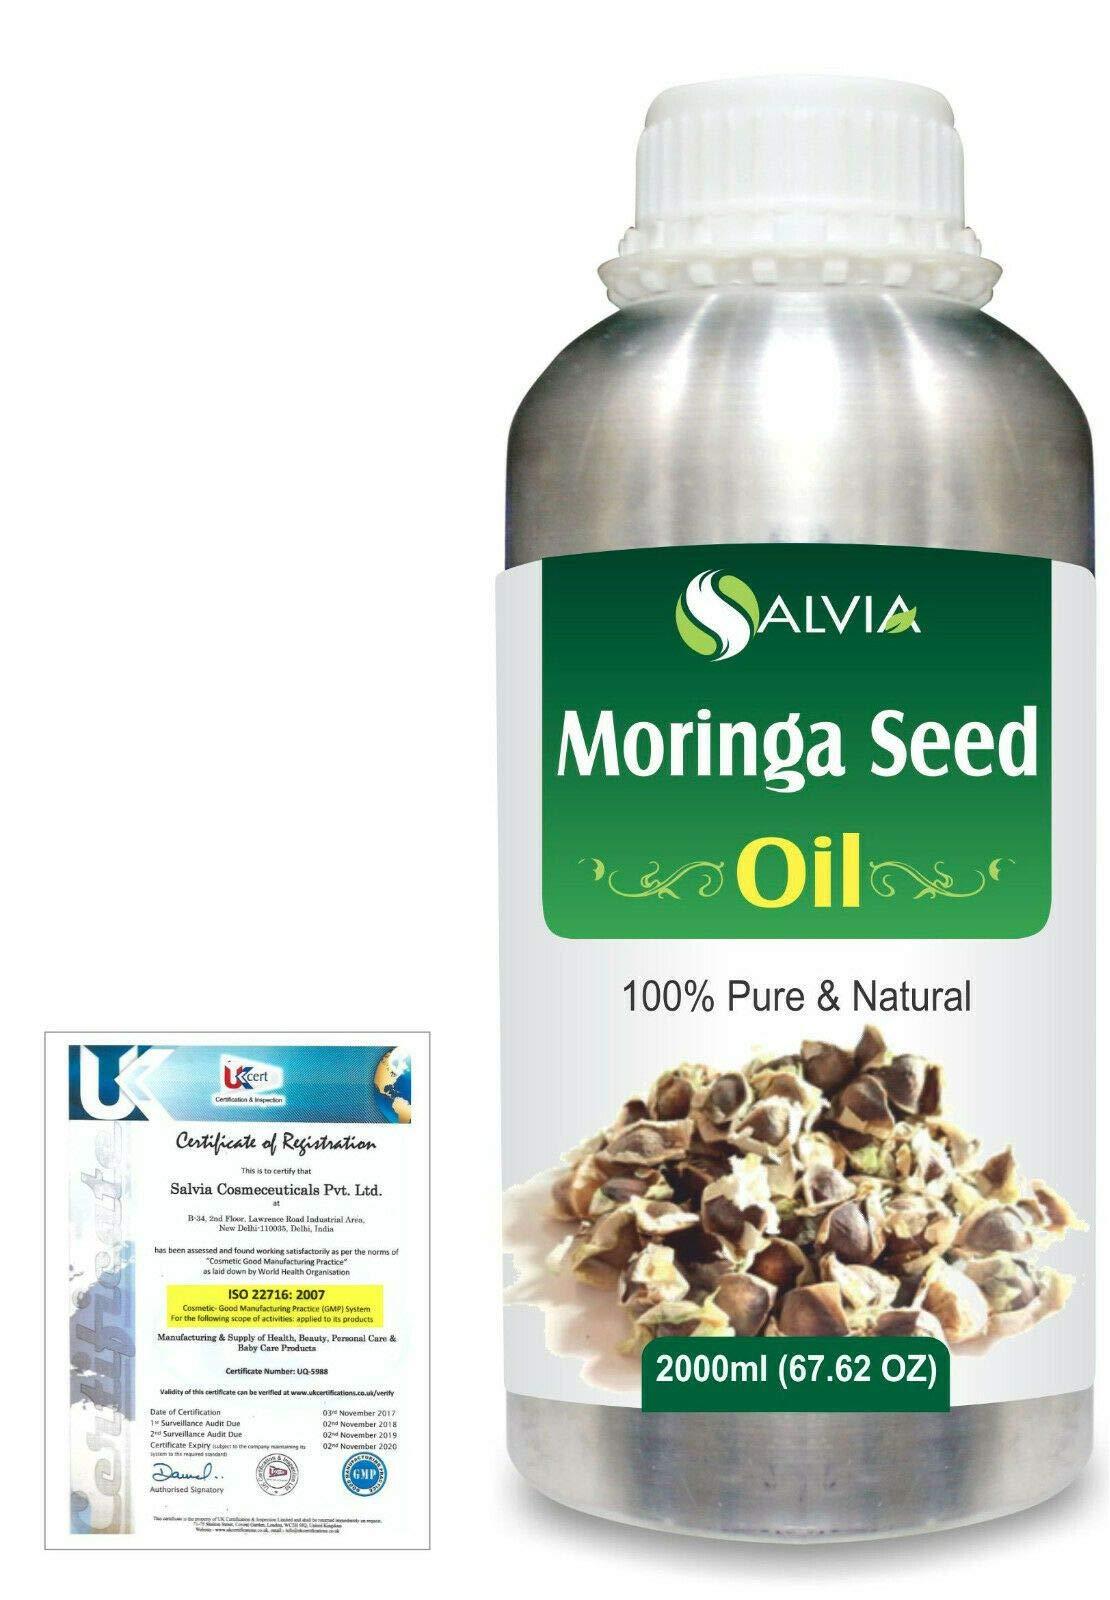 Moringa Seed (Moringa-Oleifera) Pure Natural Aromatherapy Therapeutic Uncut Undiluted Carrier Oil 2000ml/67.6 fl. oz. Express Shipping